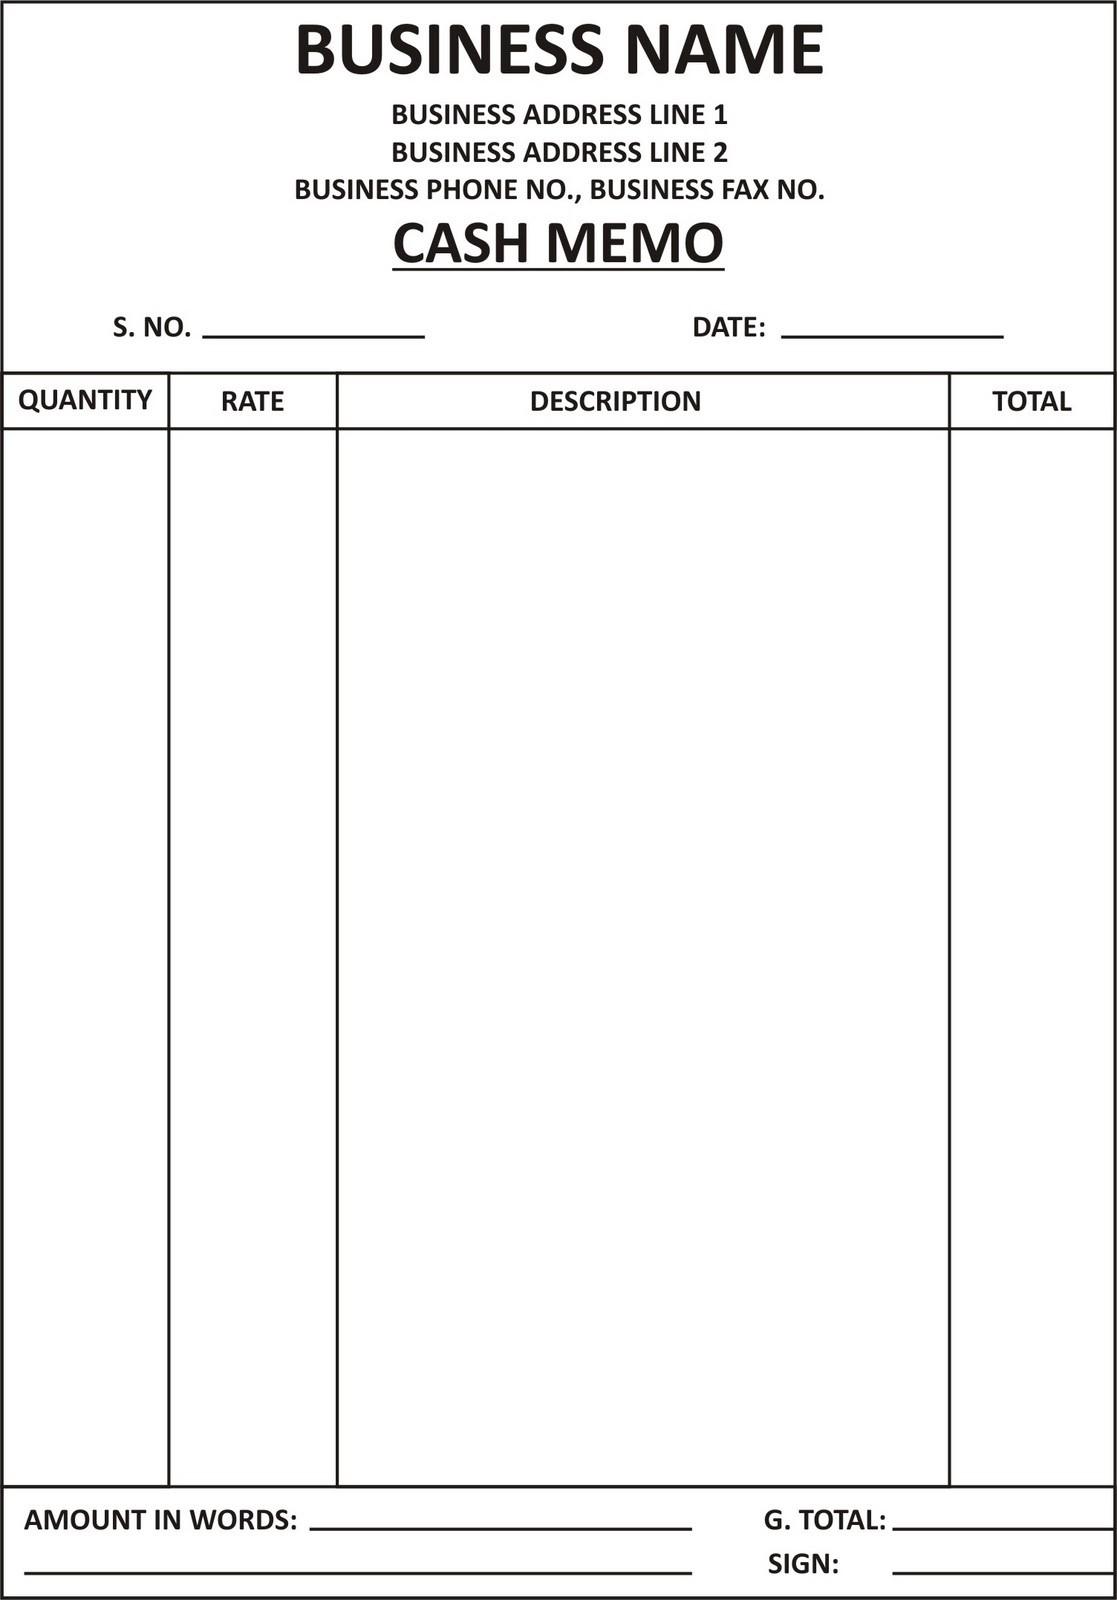 cash memo and invoise